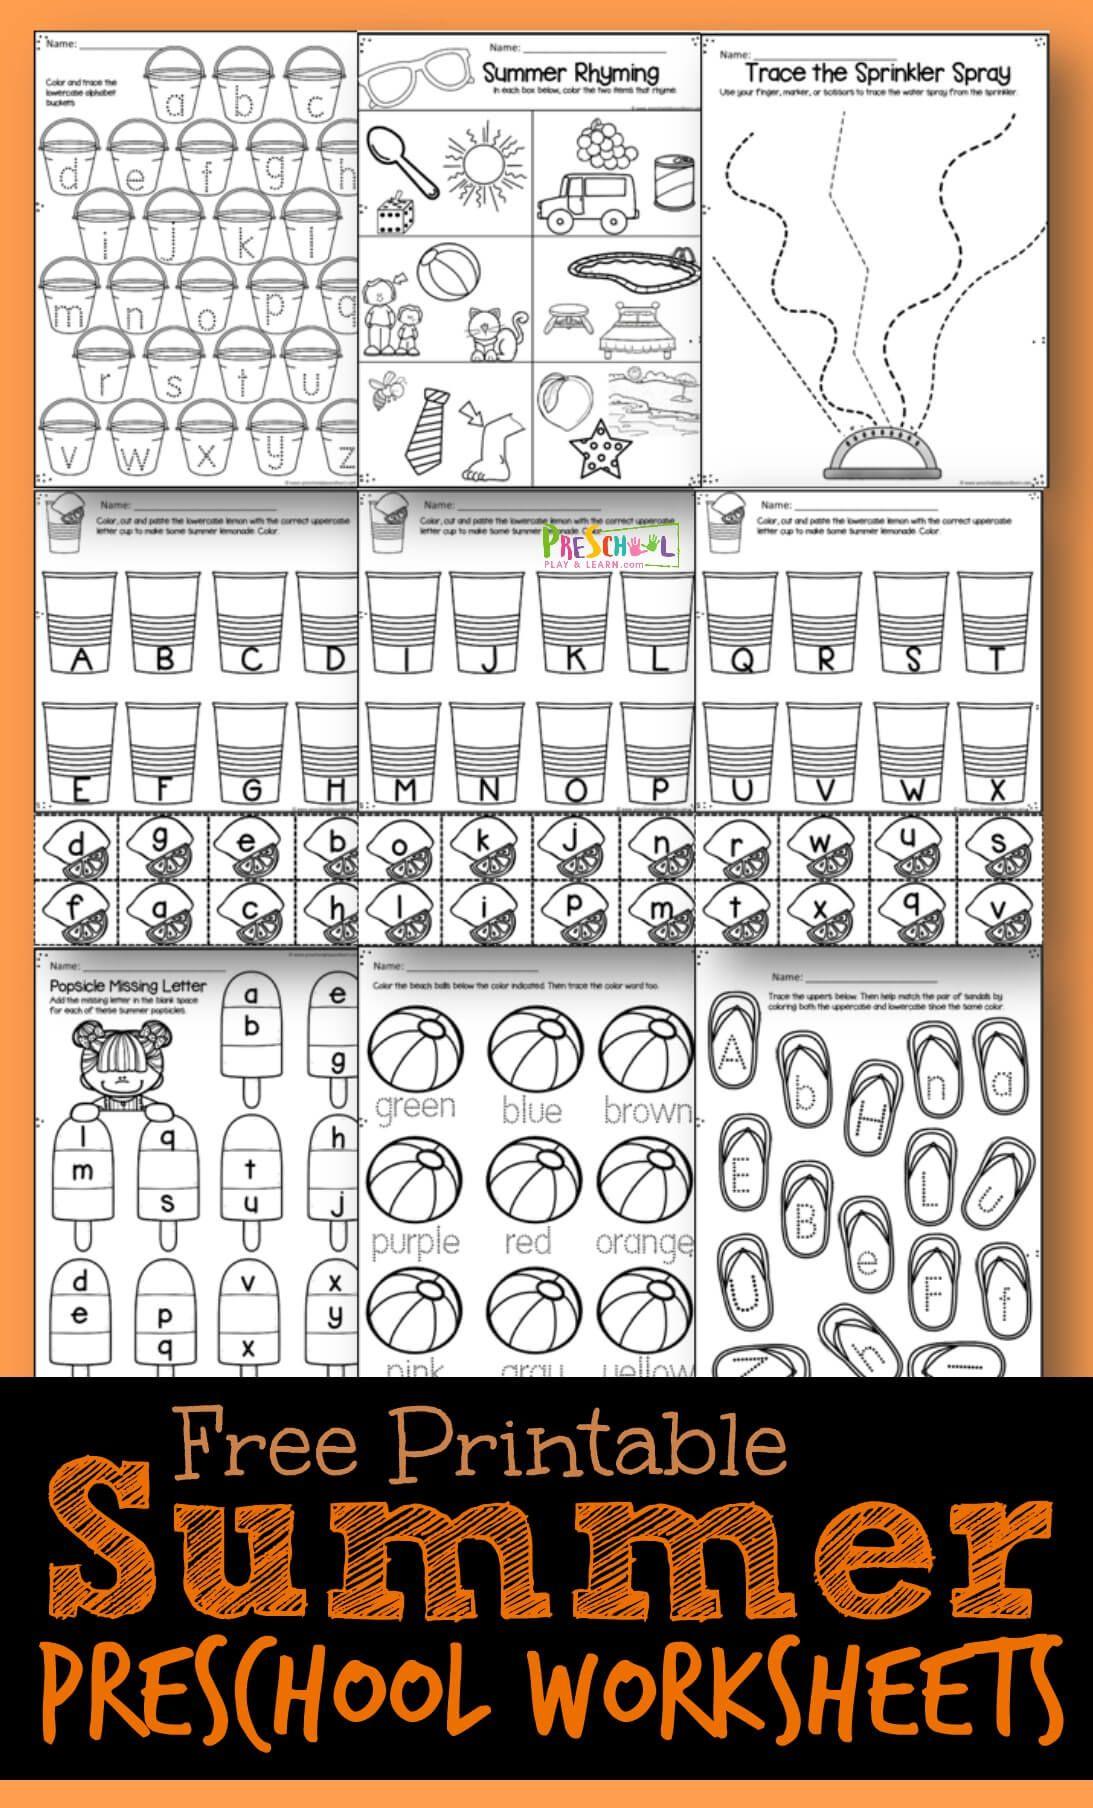 Summer Preschool Worksheets